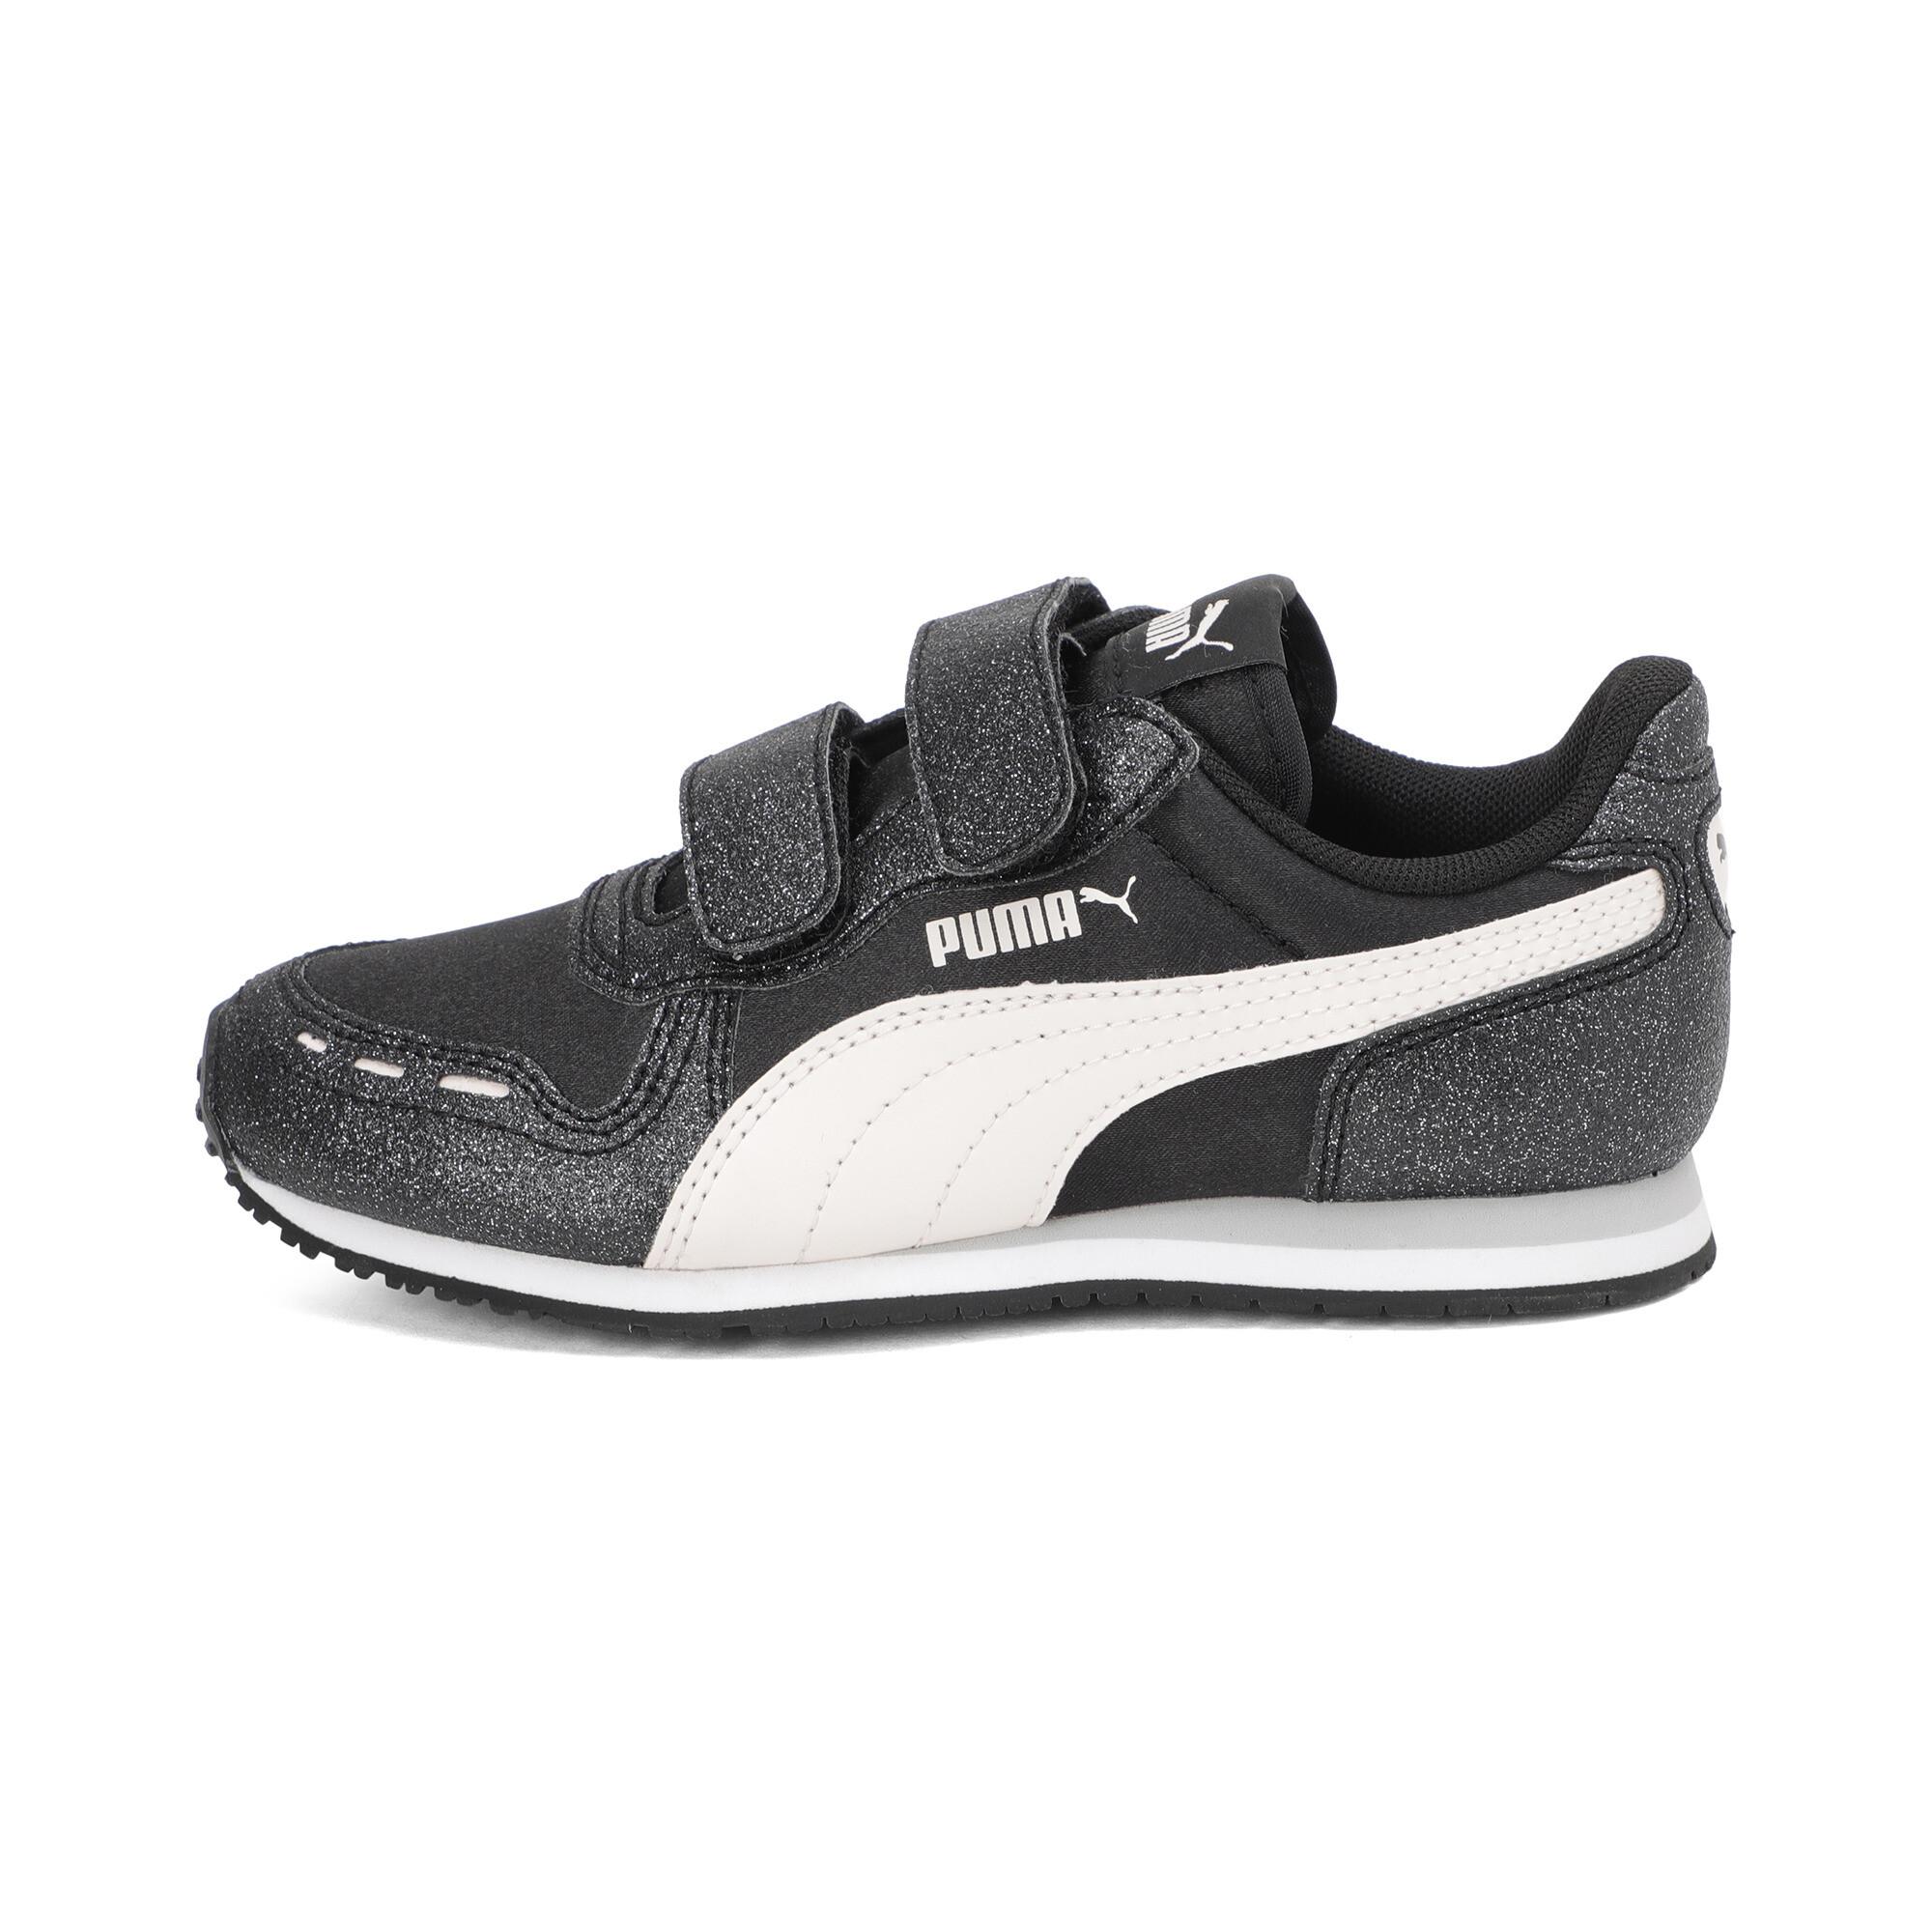 PUMA-Pre-School-Girl-039-s-Cabana-Racer-Glitz-AC-Shoes thumbnail 16